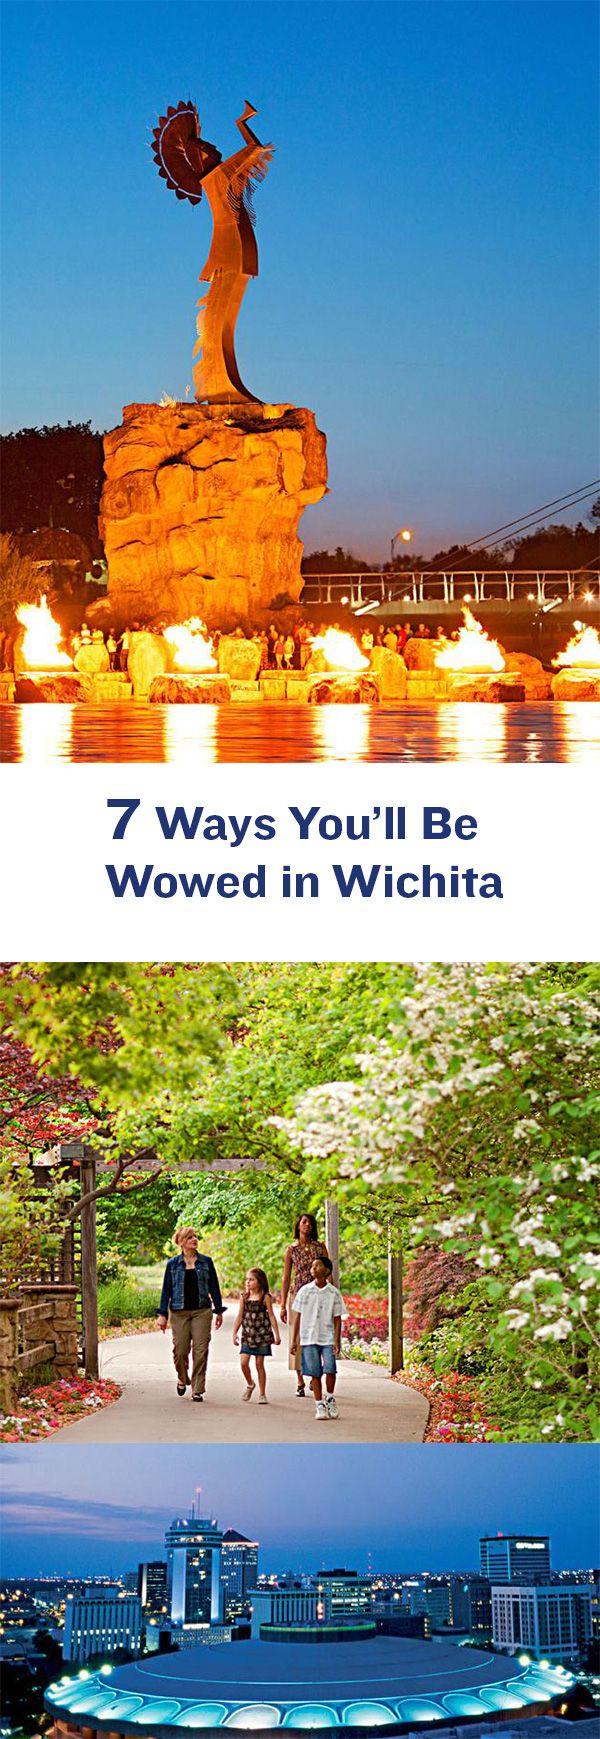 7 ways you'll be wowed in Wichita, Kansas: http://www.midwestliving.com/travel/kansas/wichita/7-ways-youll-be-wowed-wichita